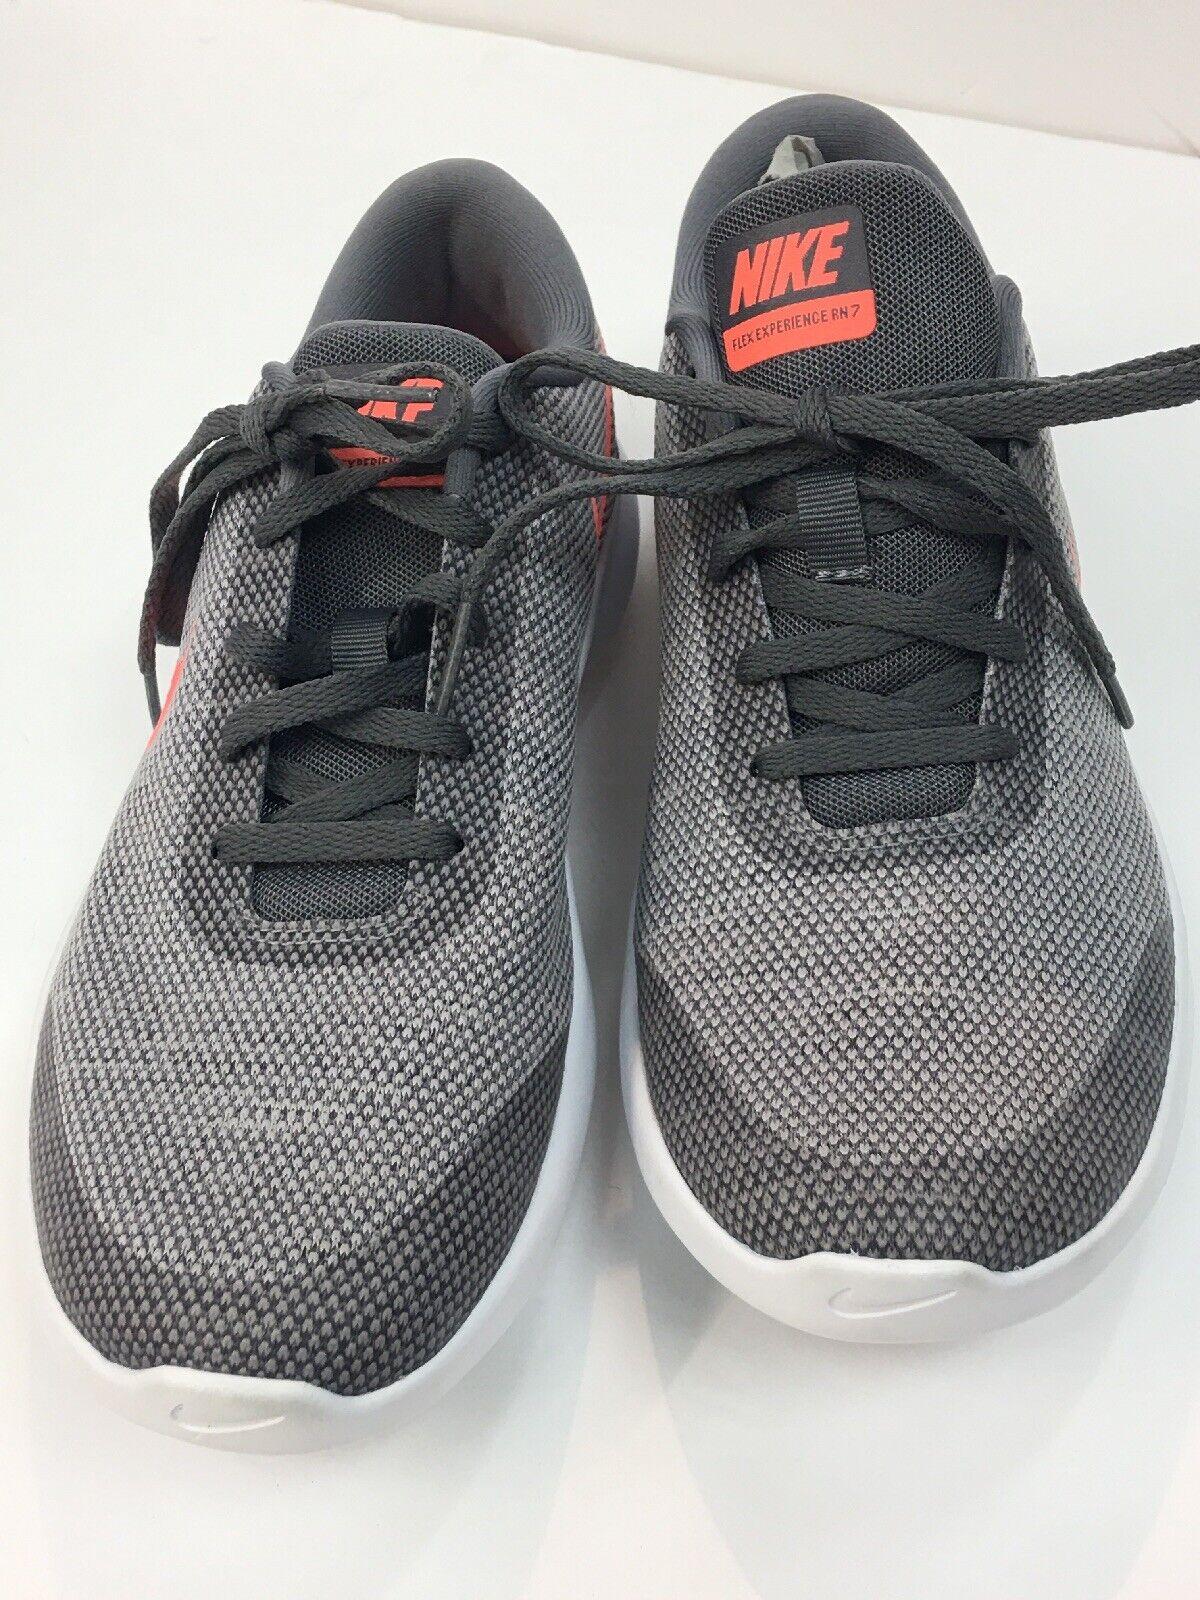 9573cd9ab NEW Nike Women s FLEX EXPERIENCE RN 7 Running Running Running shoes  908996-004 Size 8